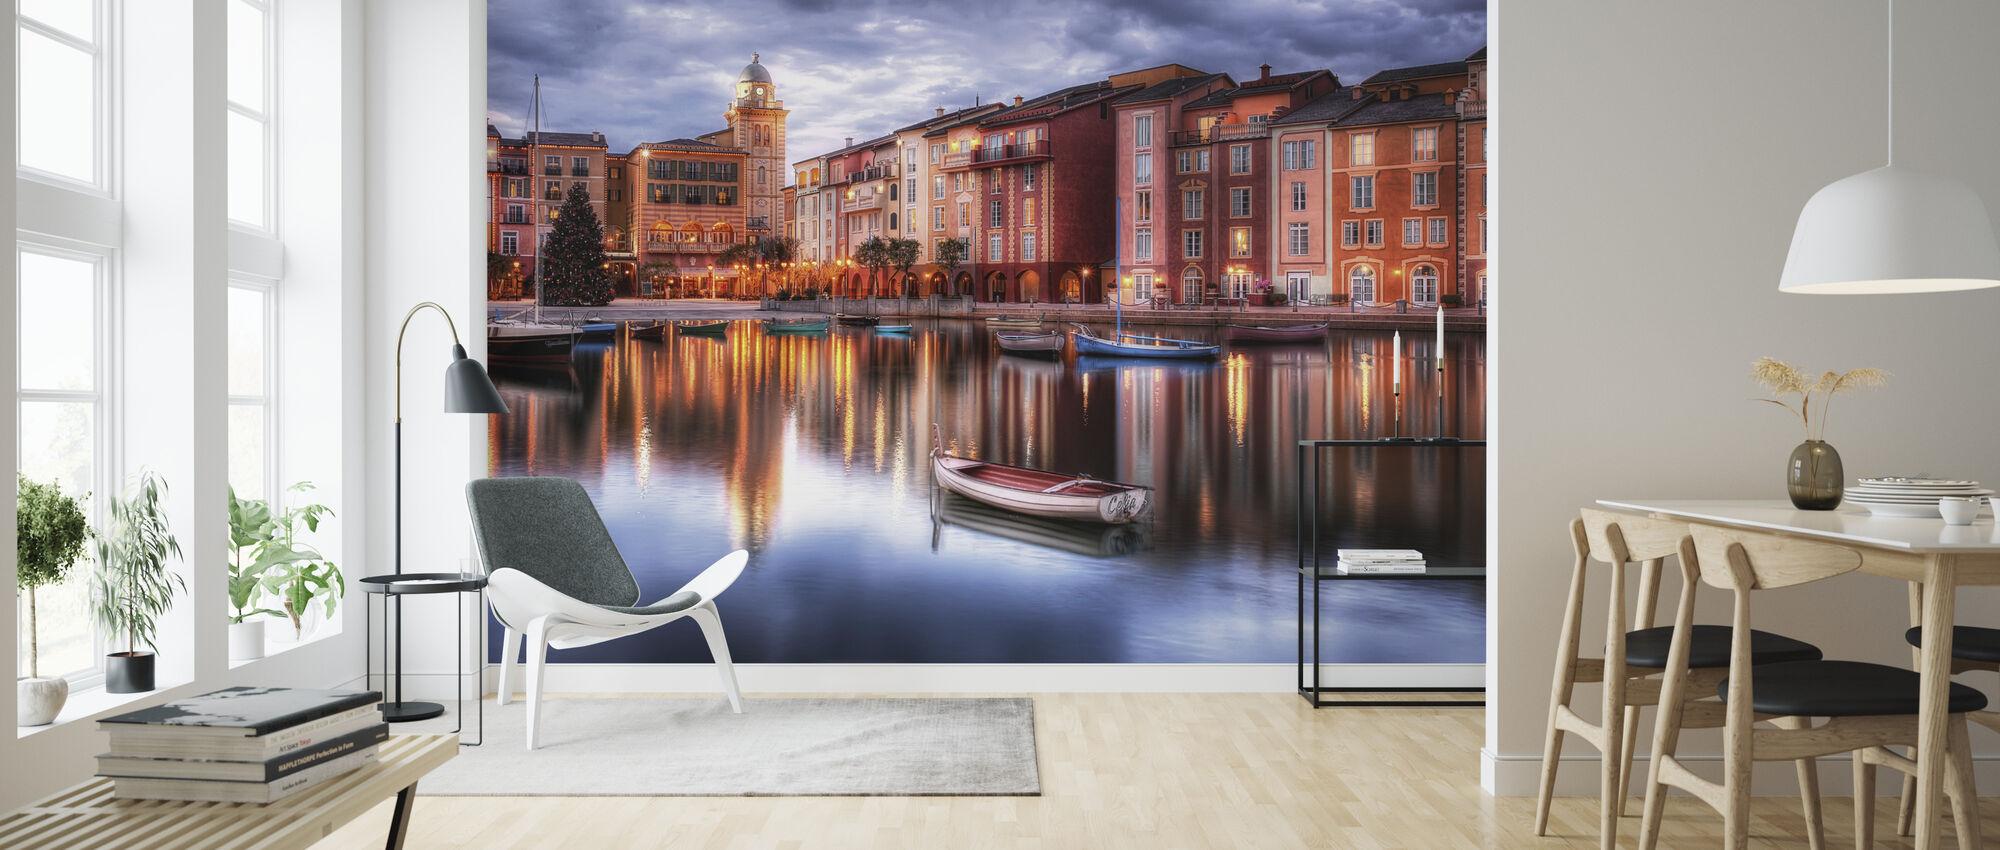 Portofino Bay Hotel in Orlando, Florida - Wallpaper - Living Room